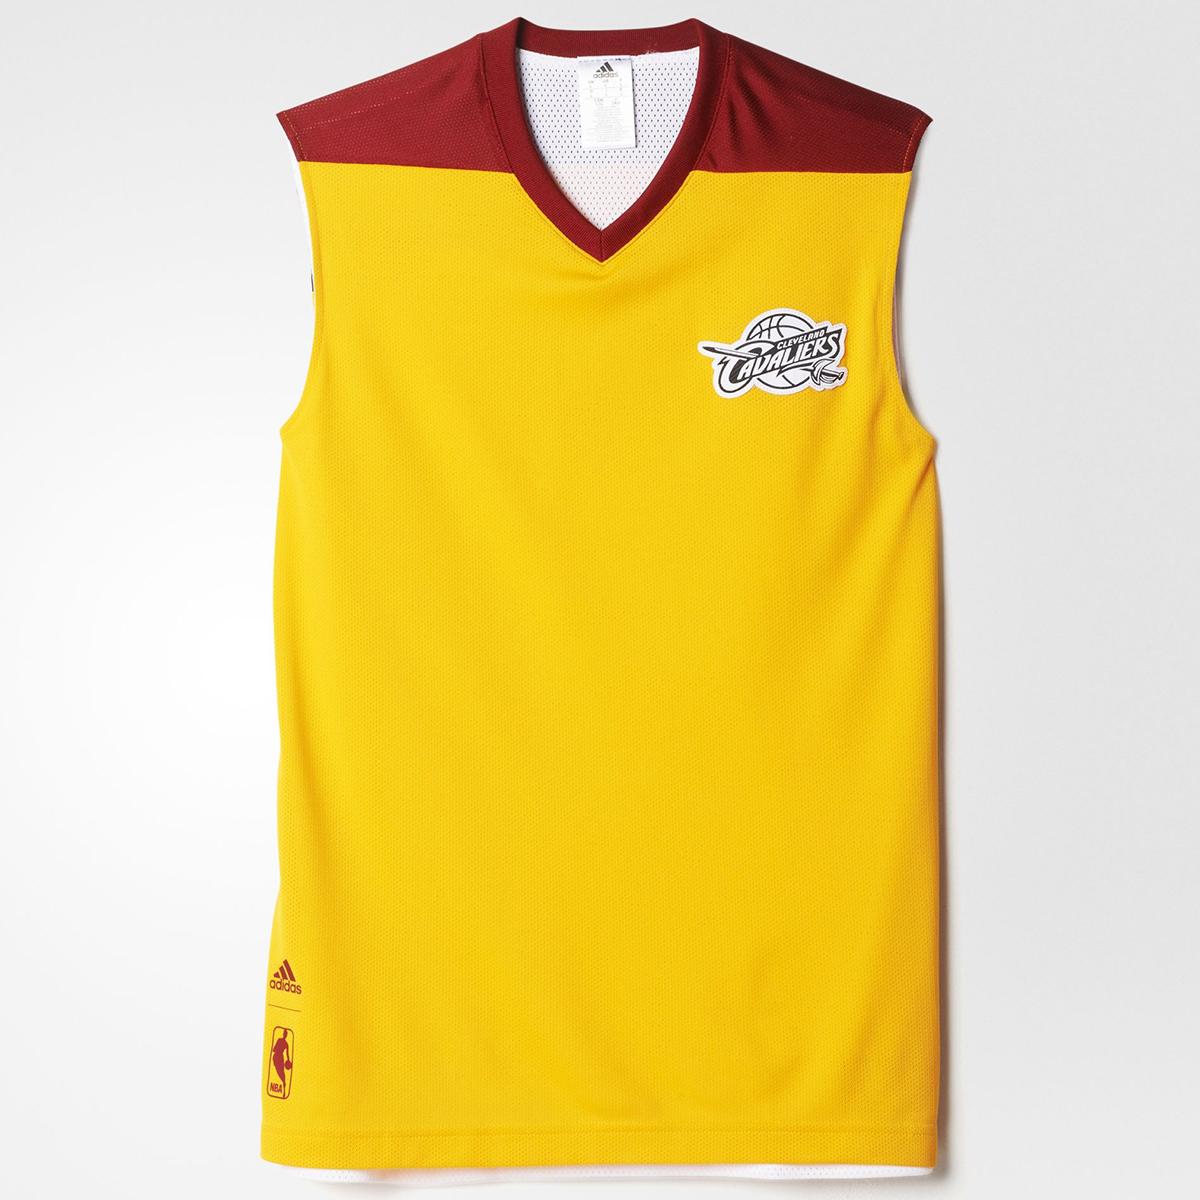 adidas NBA Cleveland Cavaliers Summer Run Reversible Sleeveless Tee - NBA  Shop Cleveland Cavaliers Merchandise - Superfanas.lt 757552953